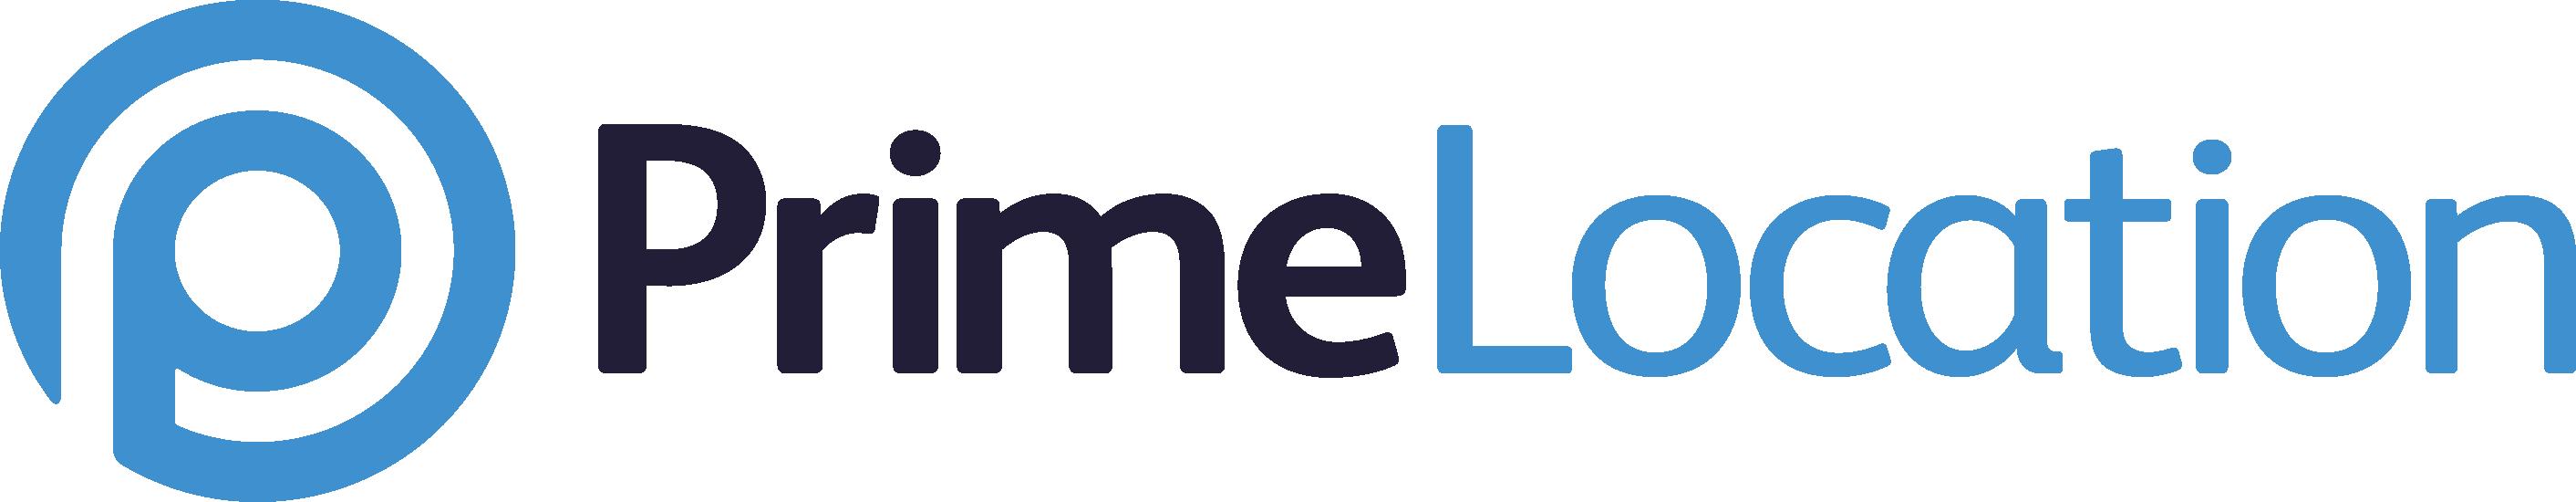 Prime Location Logo